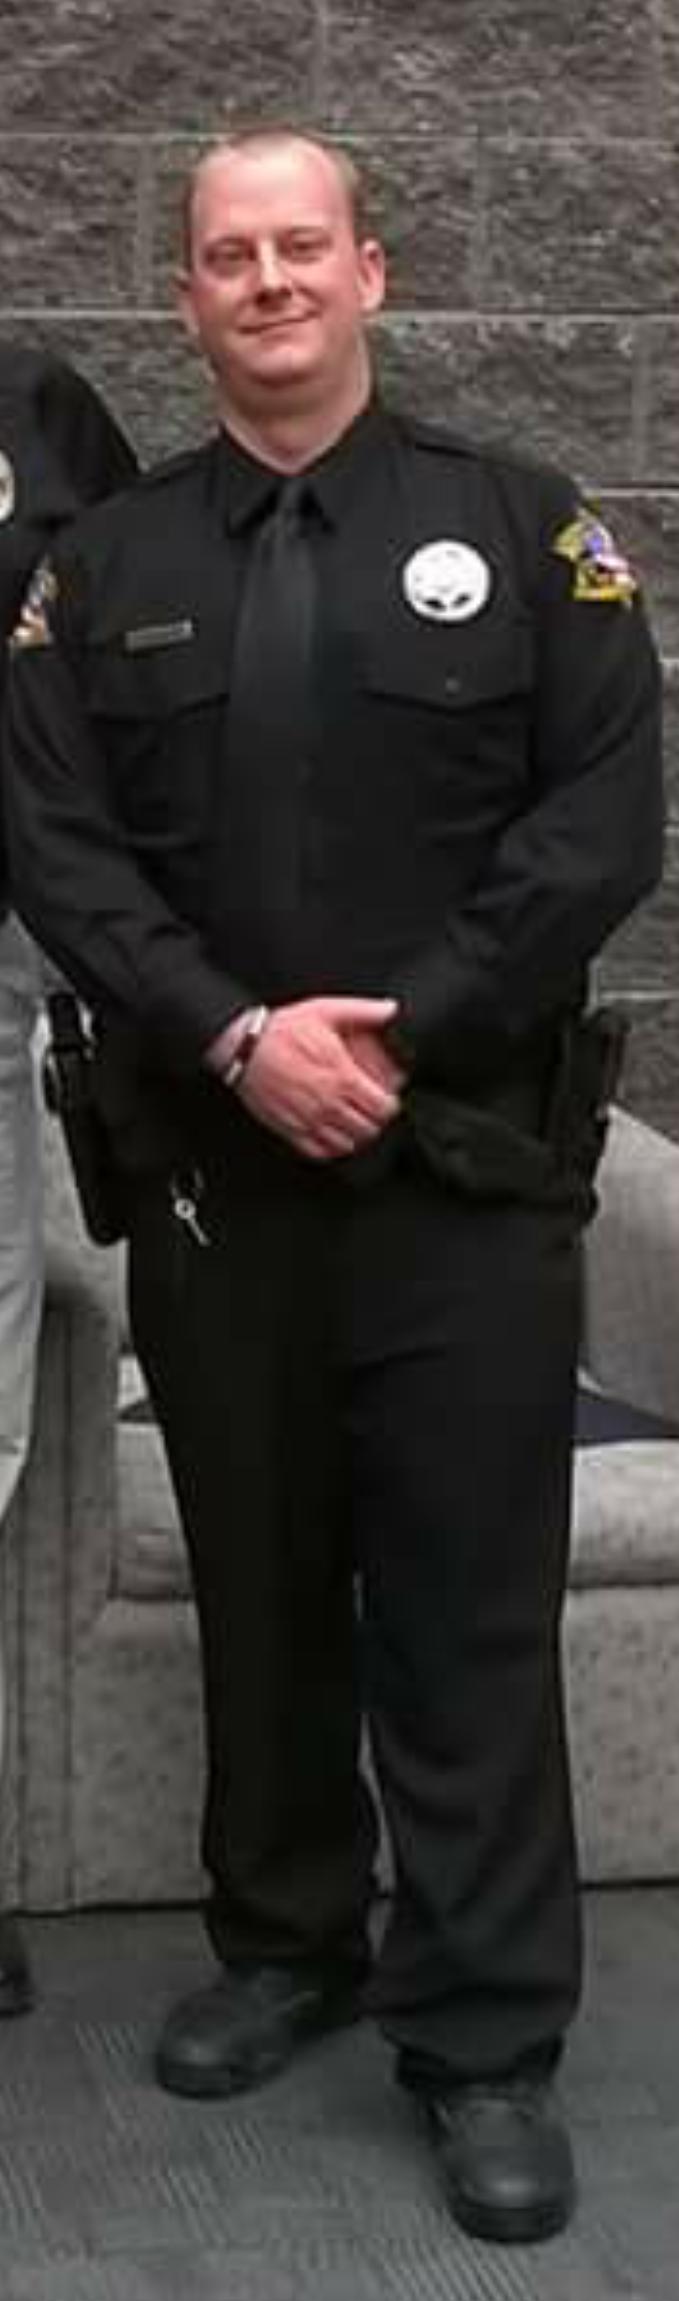 Deputy Sheriff Edward Jason Wright | Logan County Sheriff's Office, Oklahoma